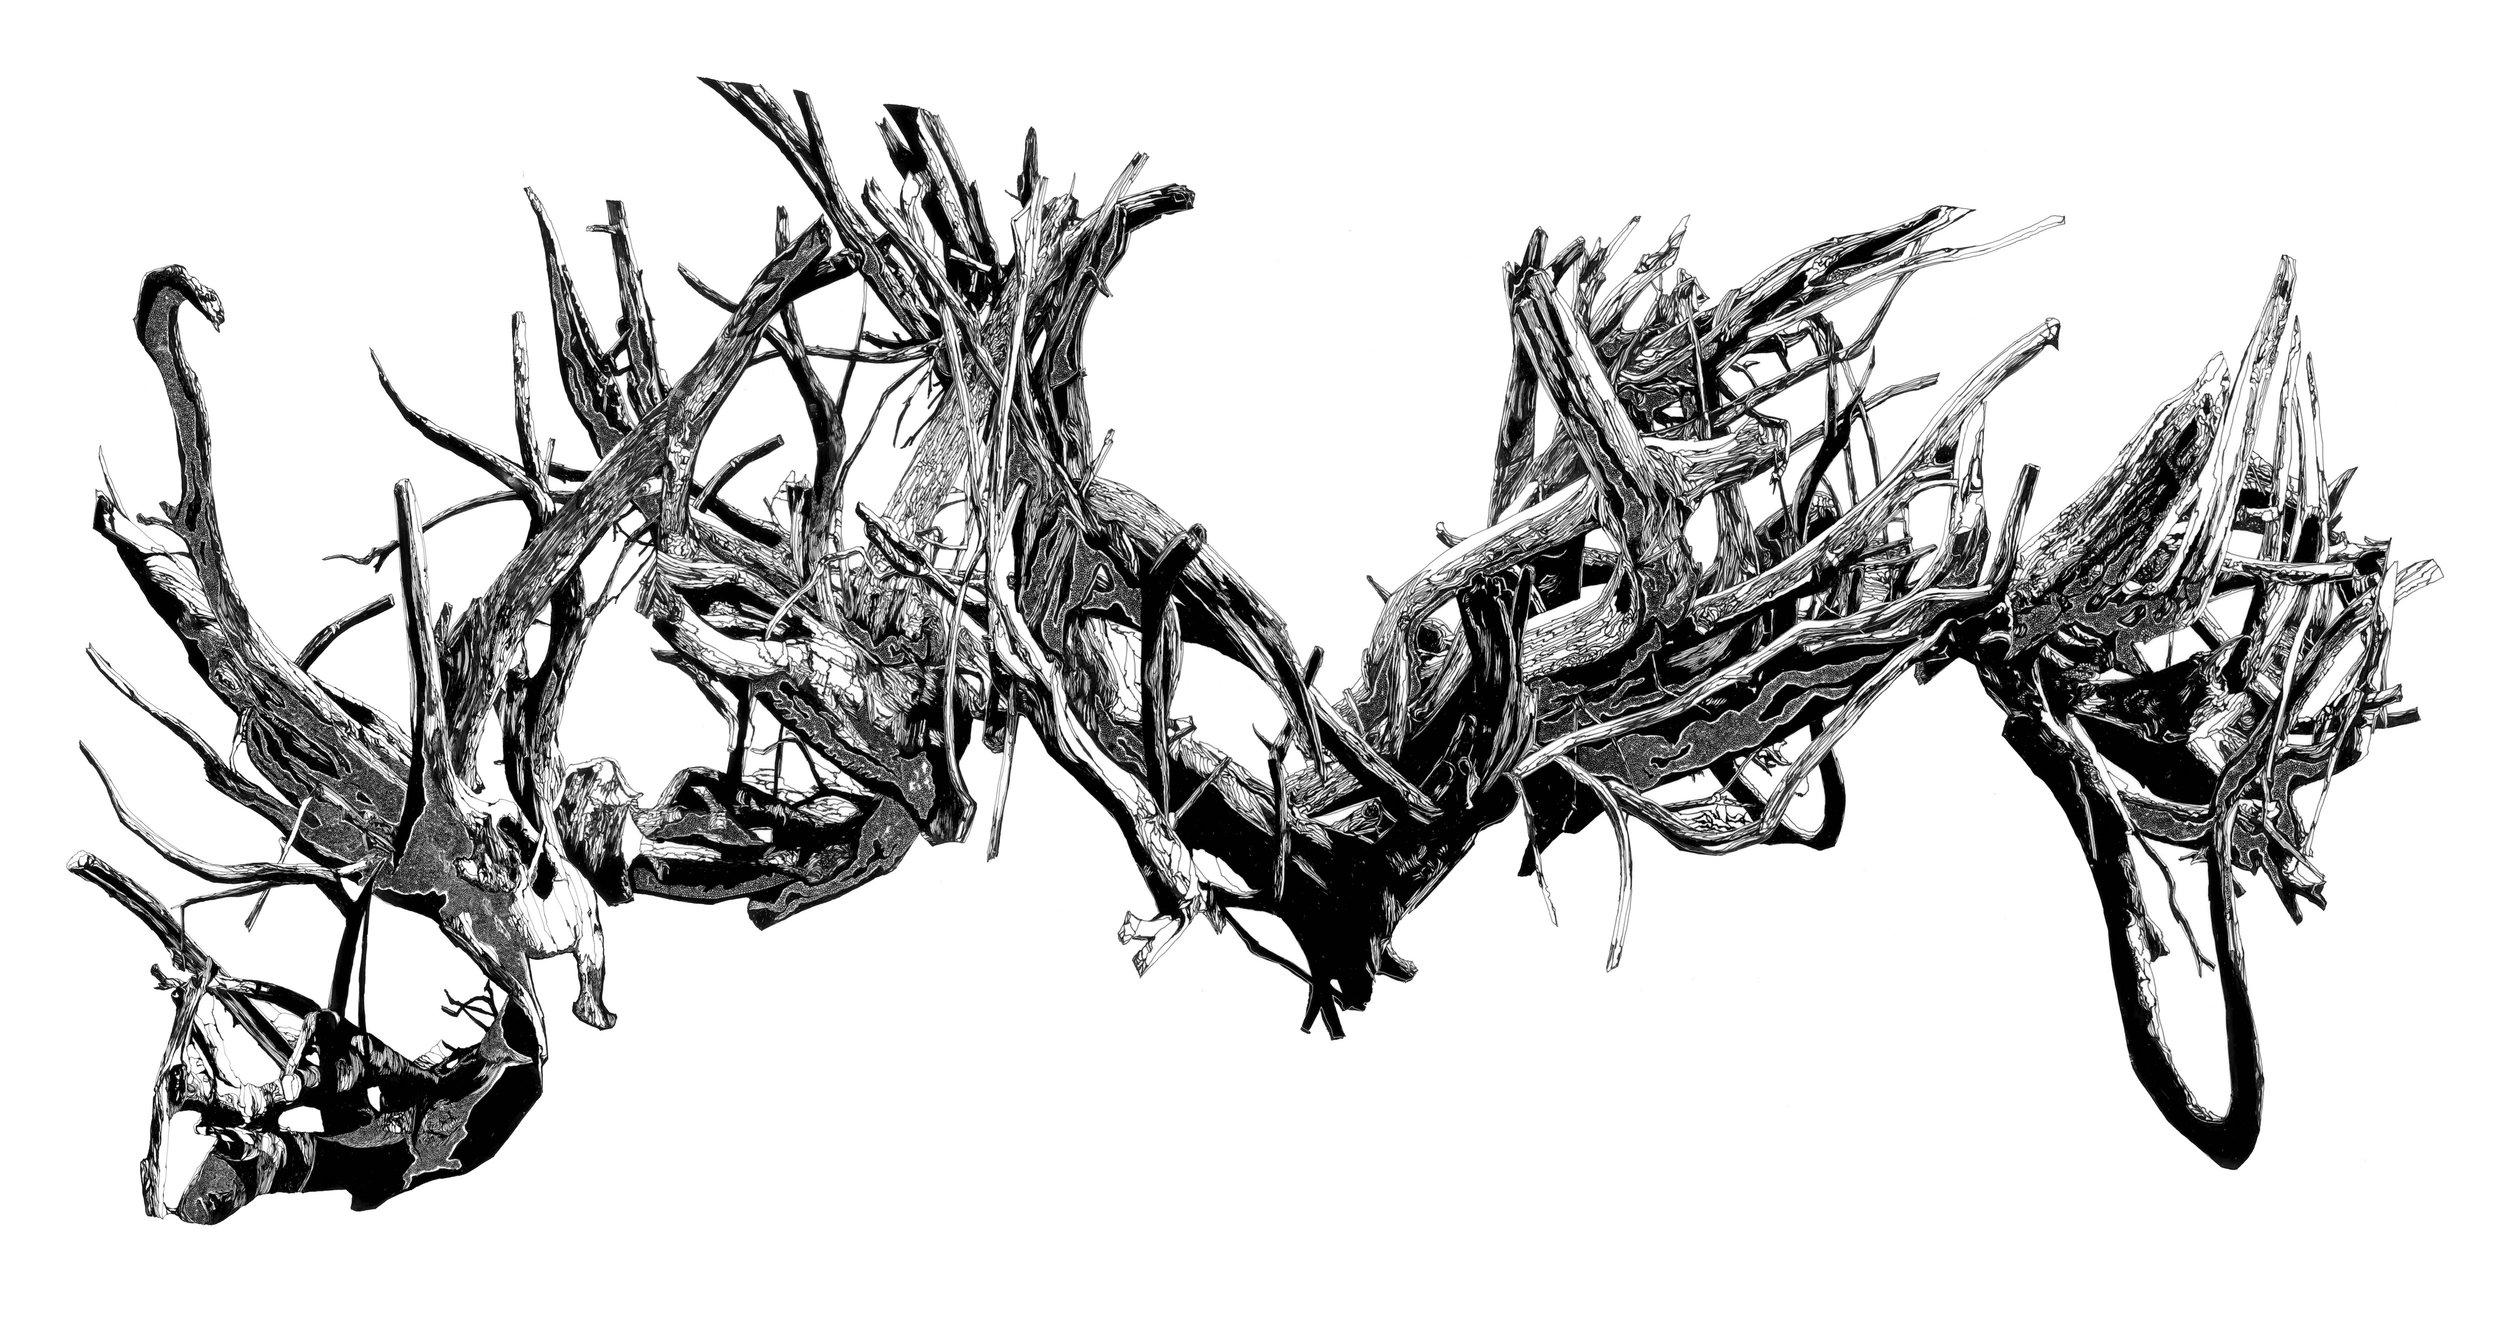 driftwood composite copy 2.jpg